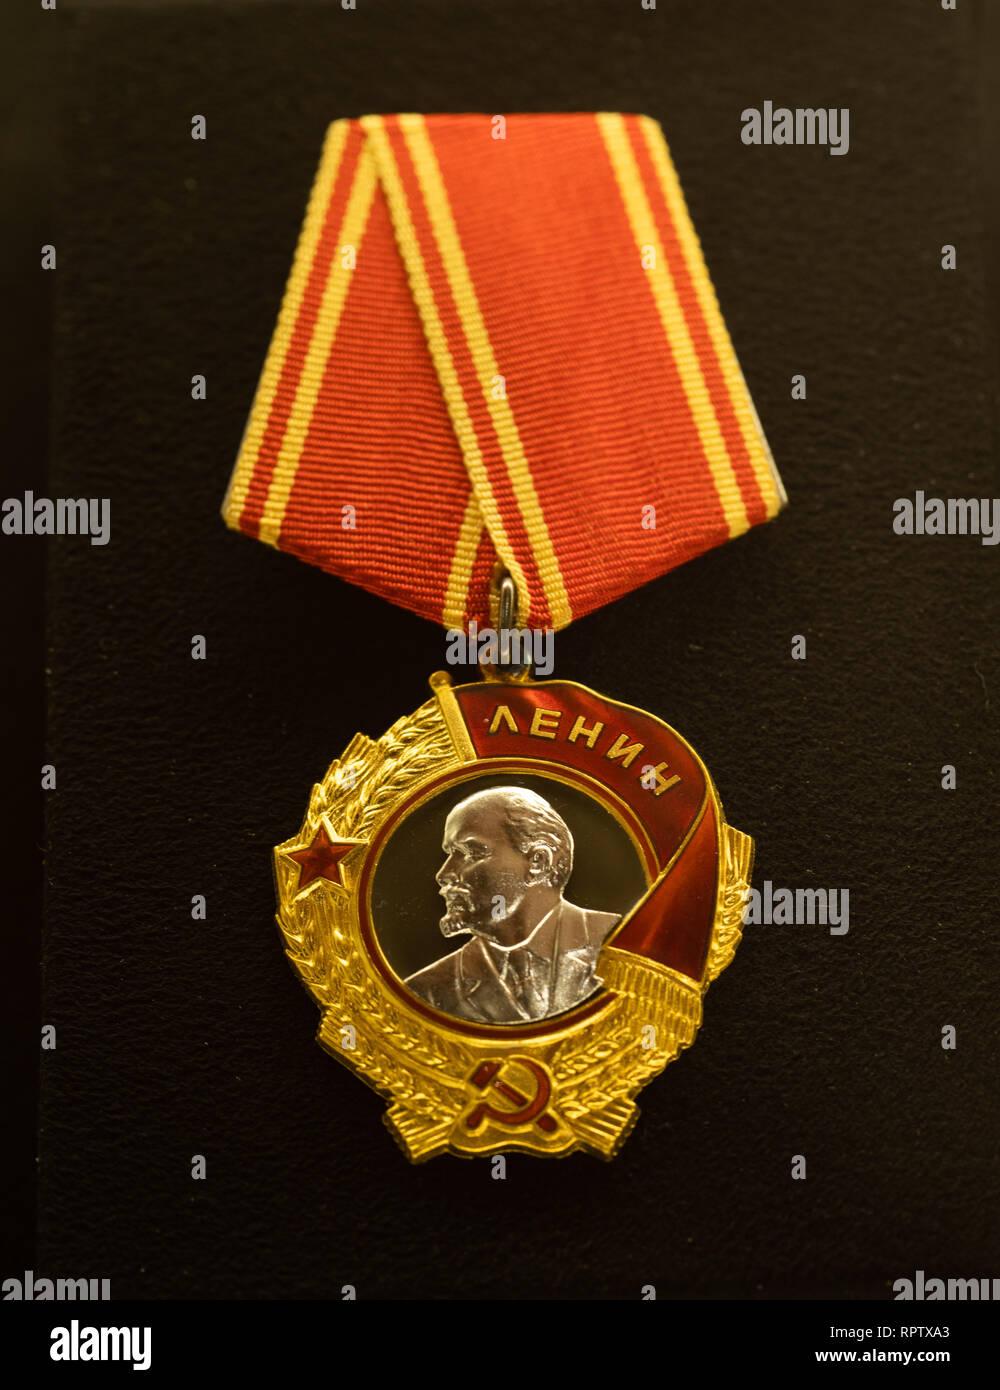 Order of Lenin of the Union of Soviet Socialist Republics, conferred to President of Finland Mauno Koivisto on 24th November 1983. Stock Photo